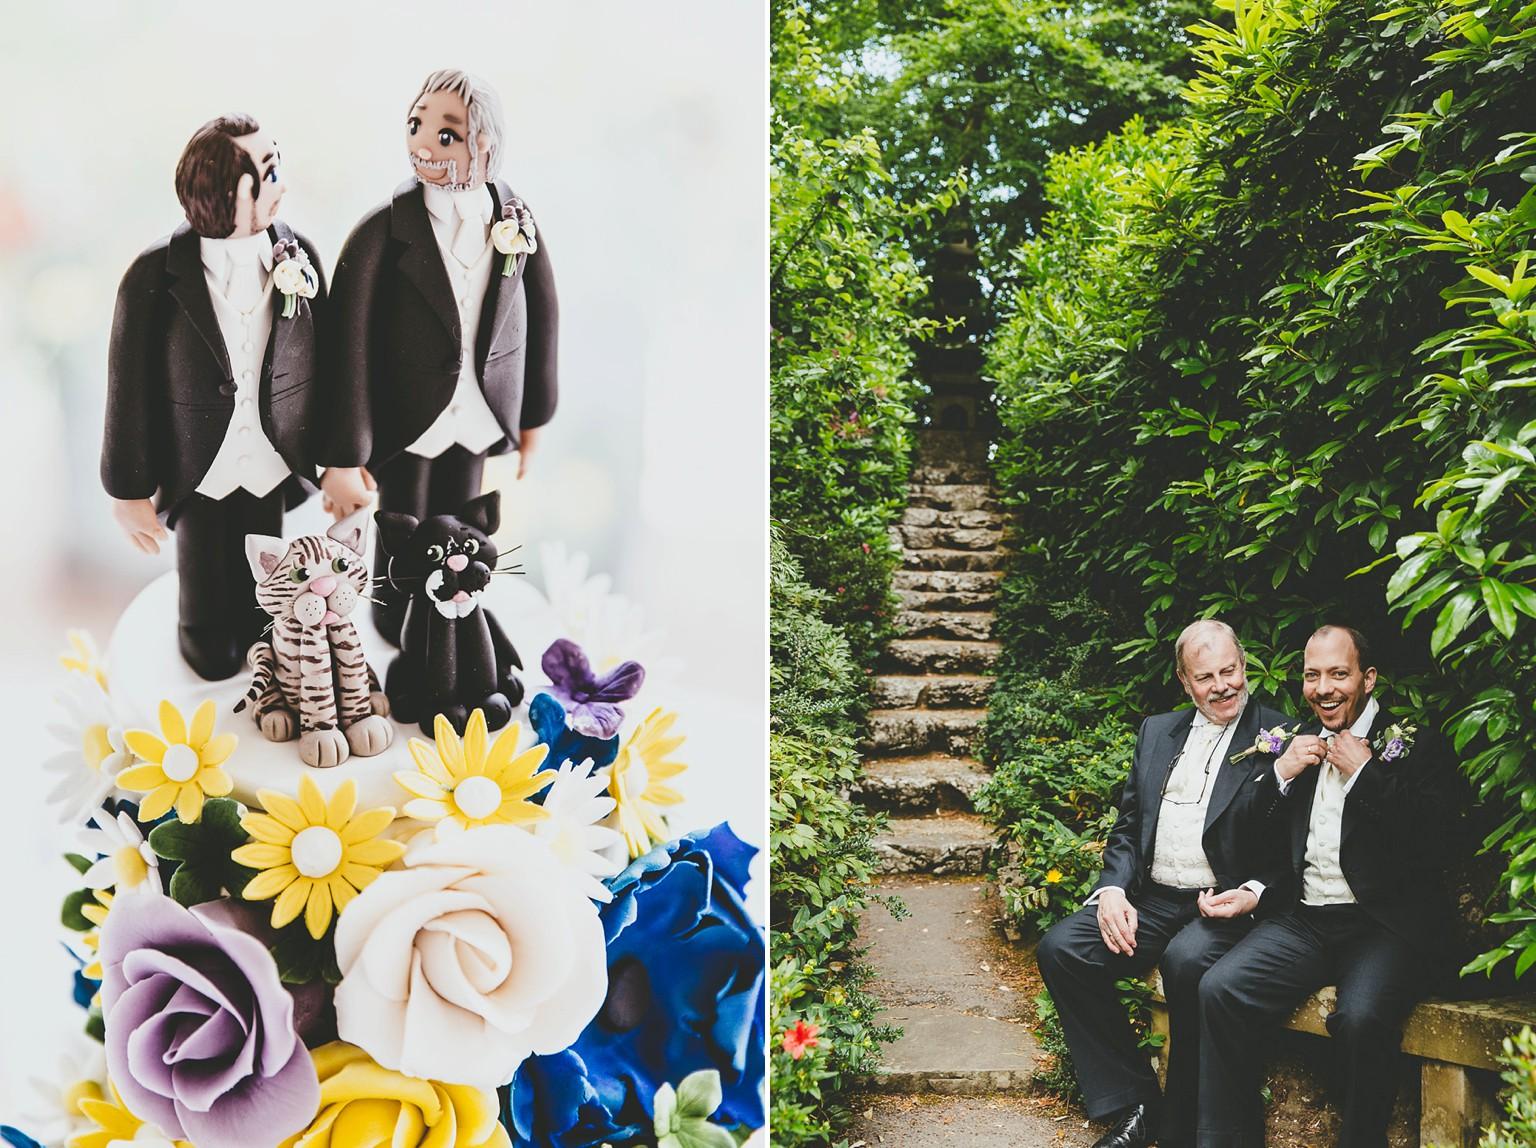 Creative-wedding-photographers-00006